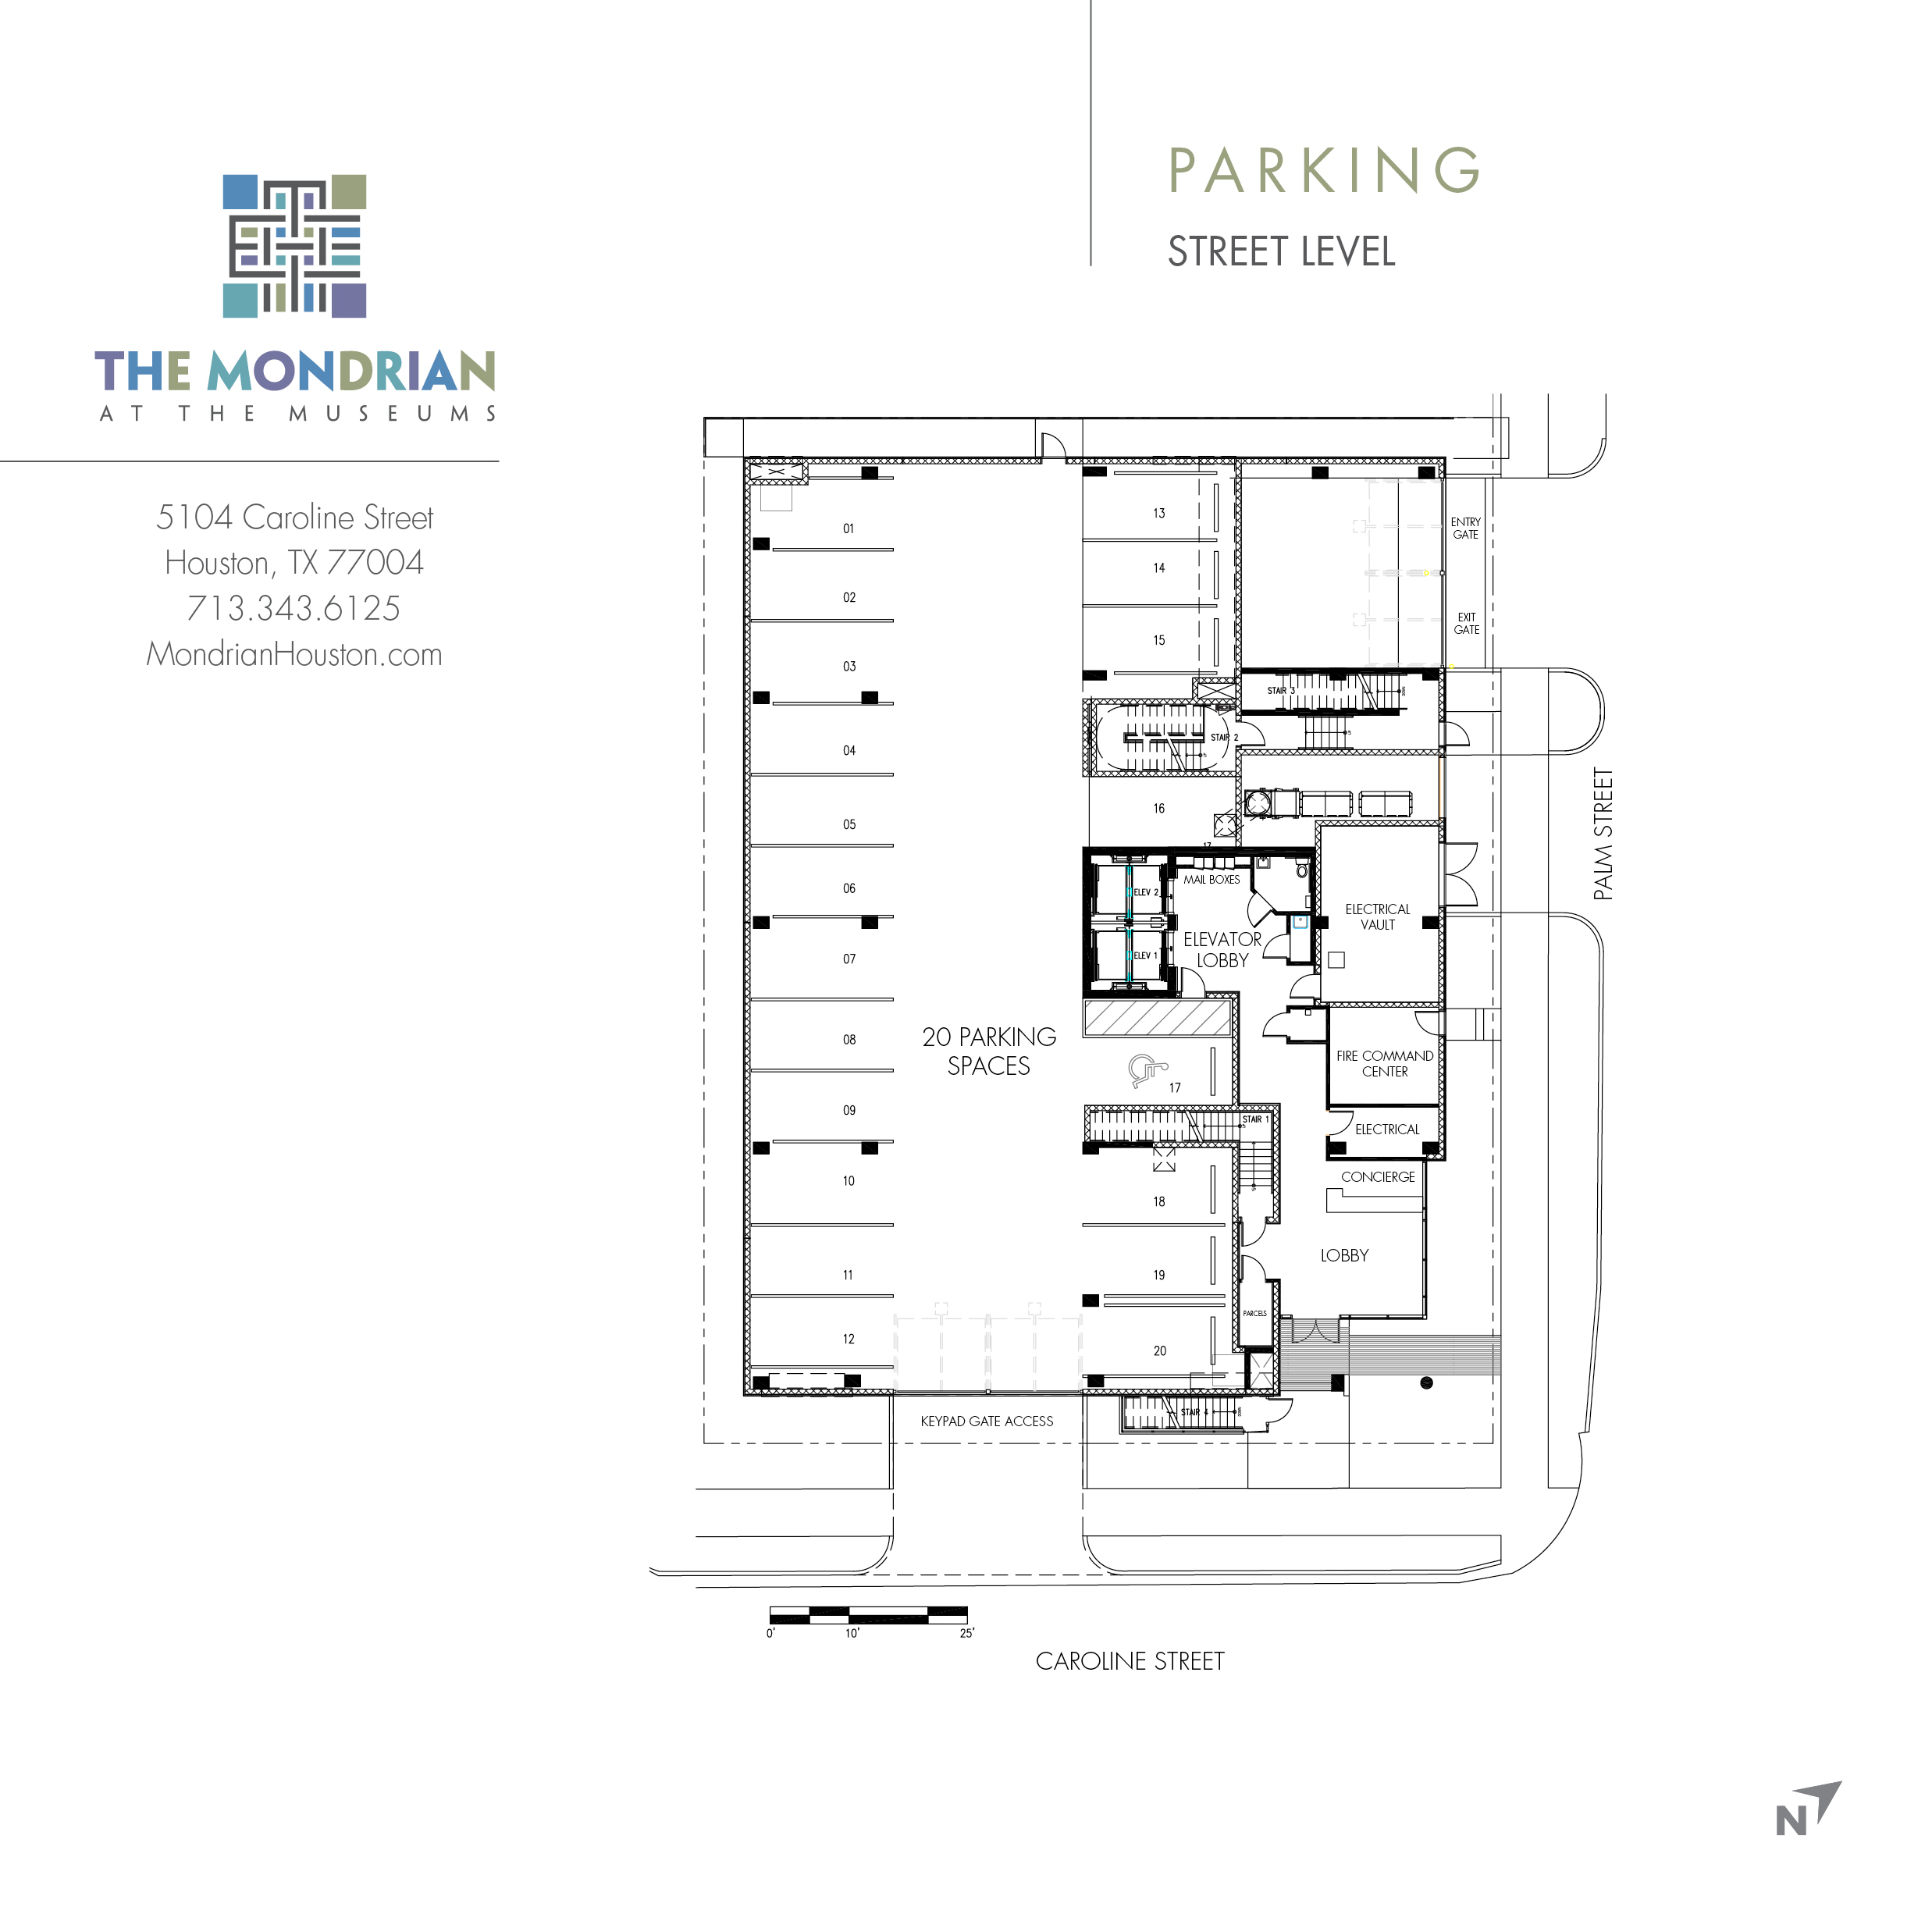 Mondrian-Parking-Street.jpg